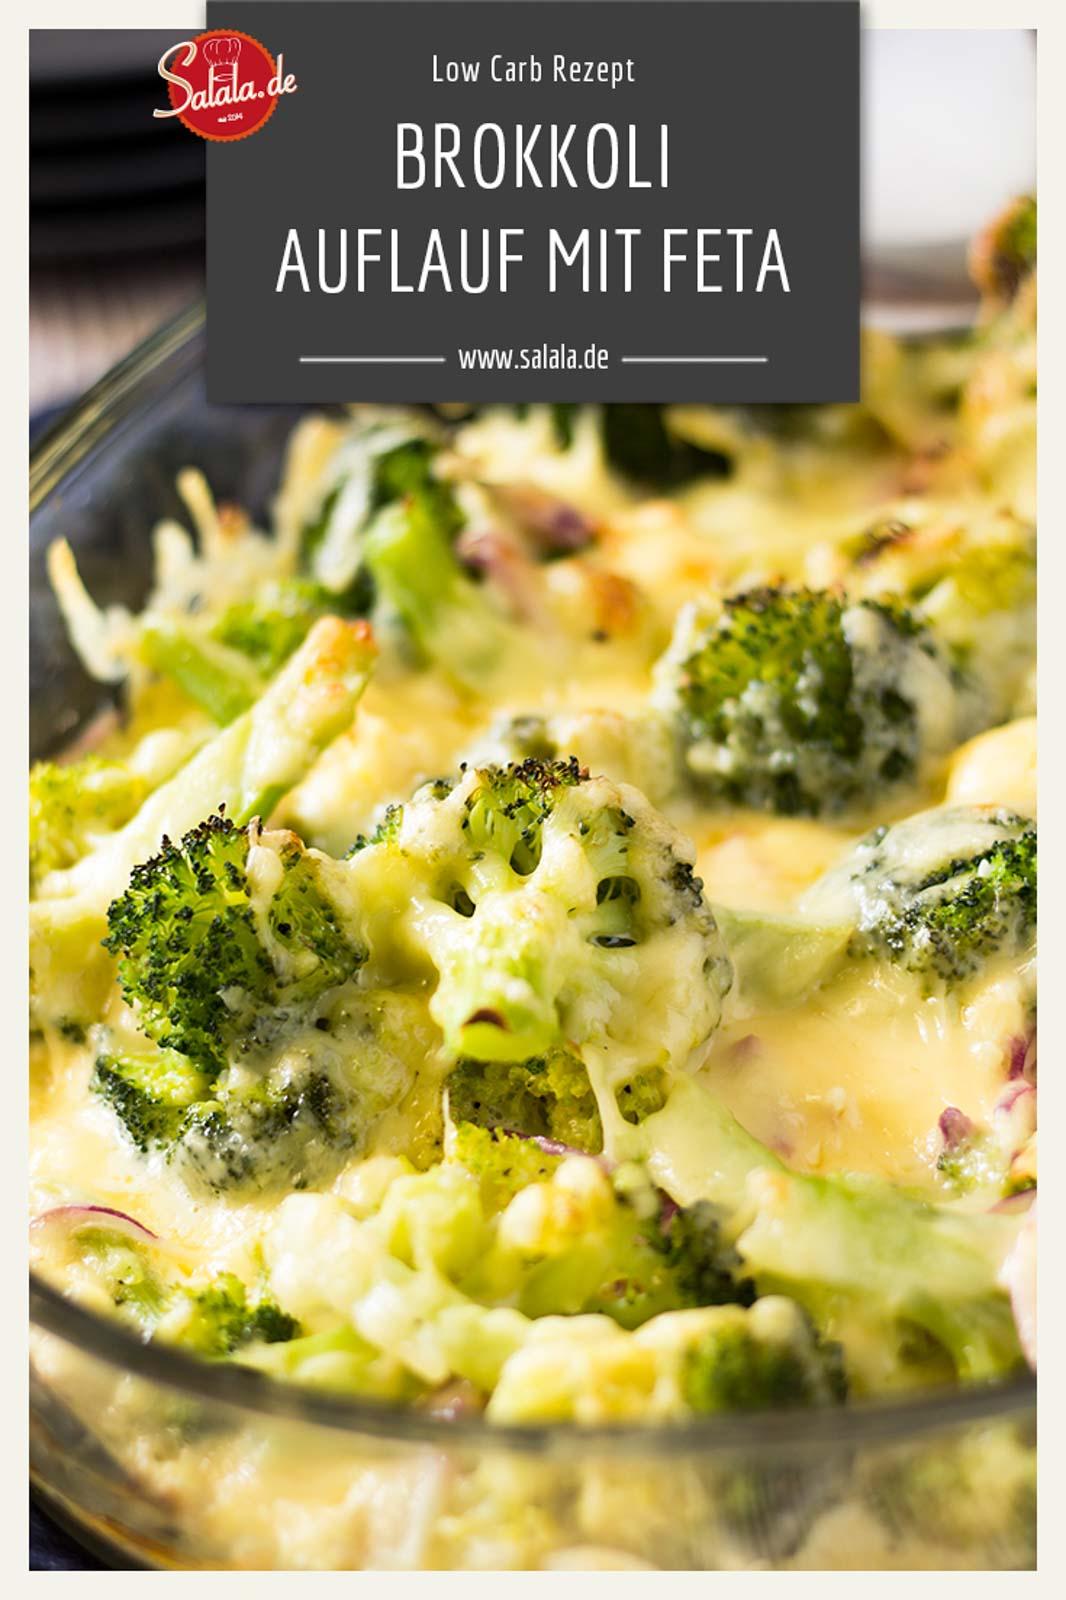 Brokkoli-Feta-Gratin - by salala.de - Low Carb Rezept vegetarisch #lowcarbrezept #lowcarb #vegetarisch #gratin #lowcarbveggie